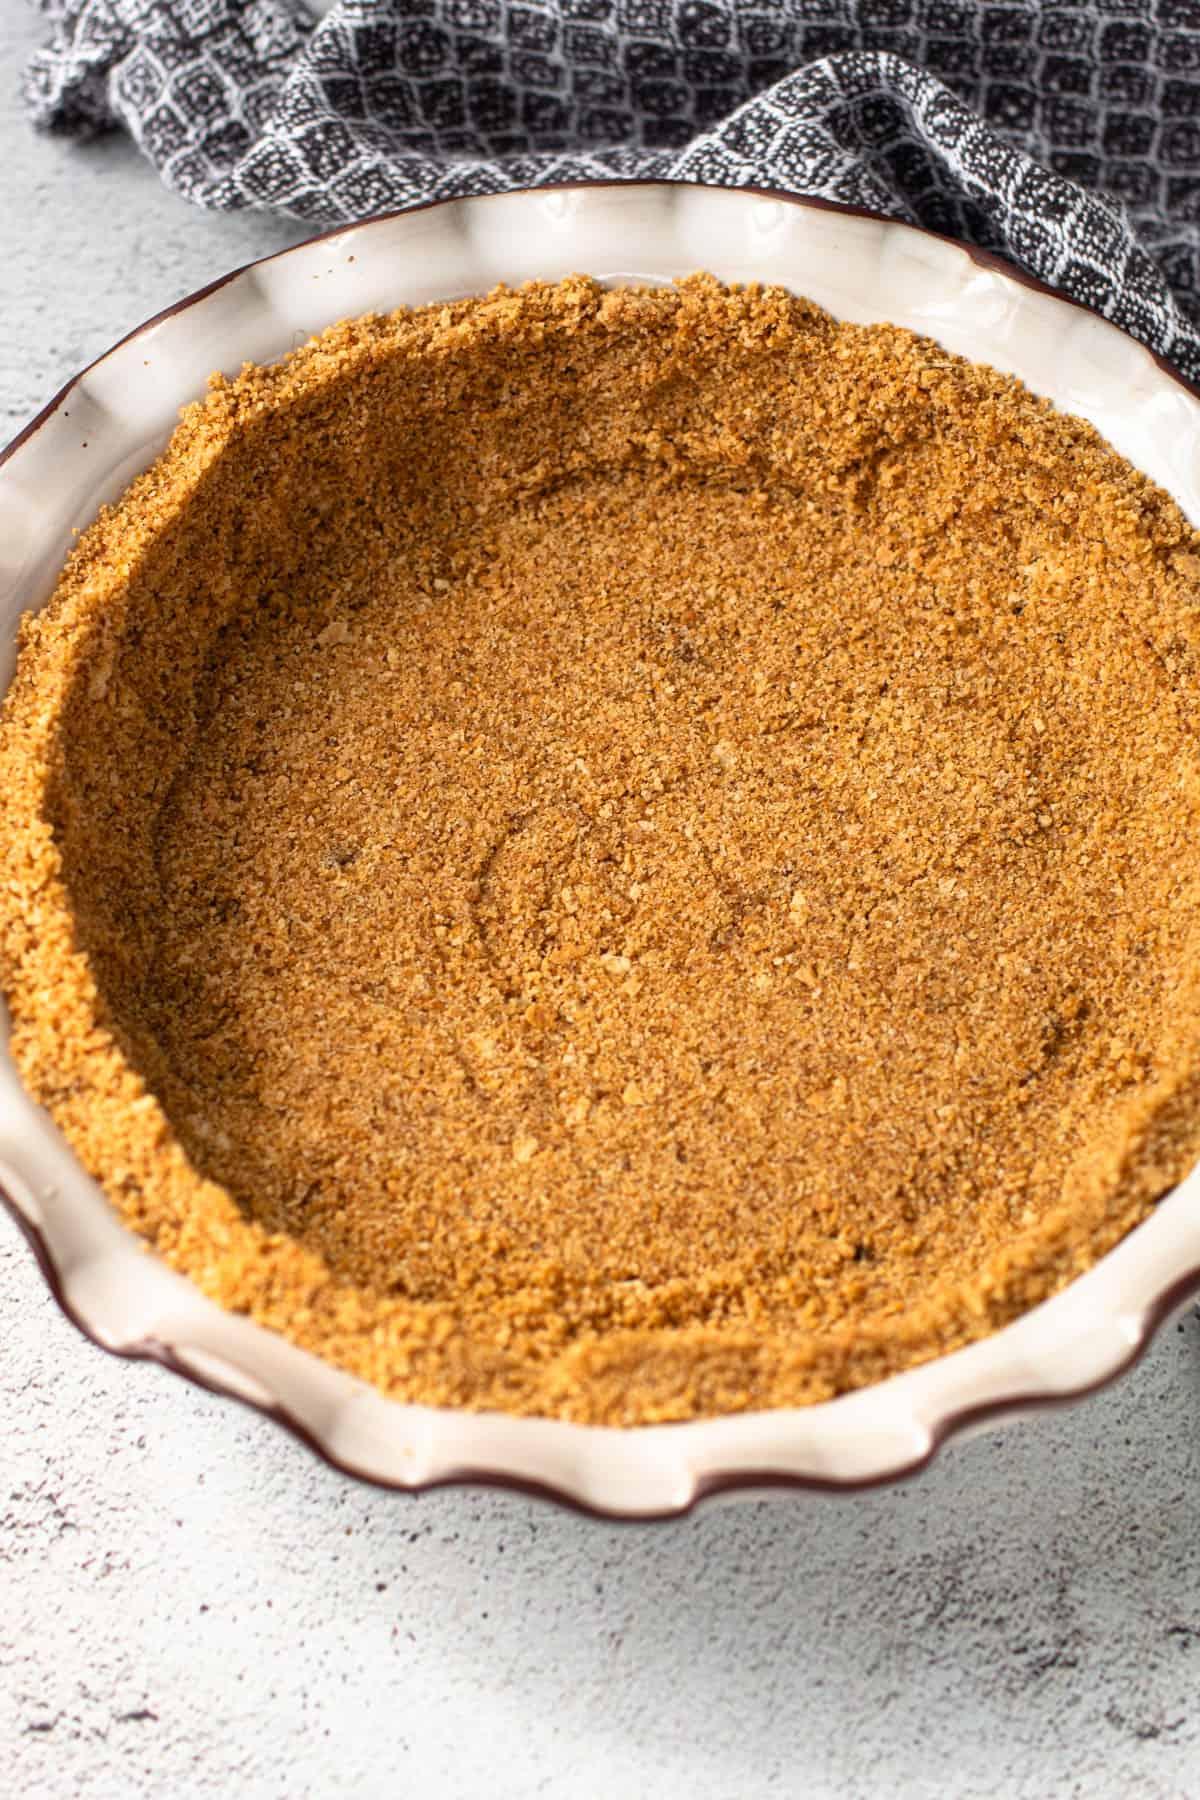 A graham cracker crust in a pie plate.